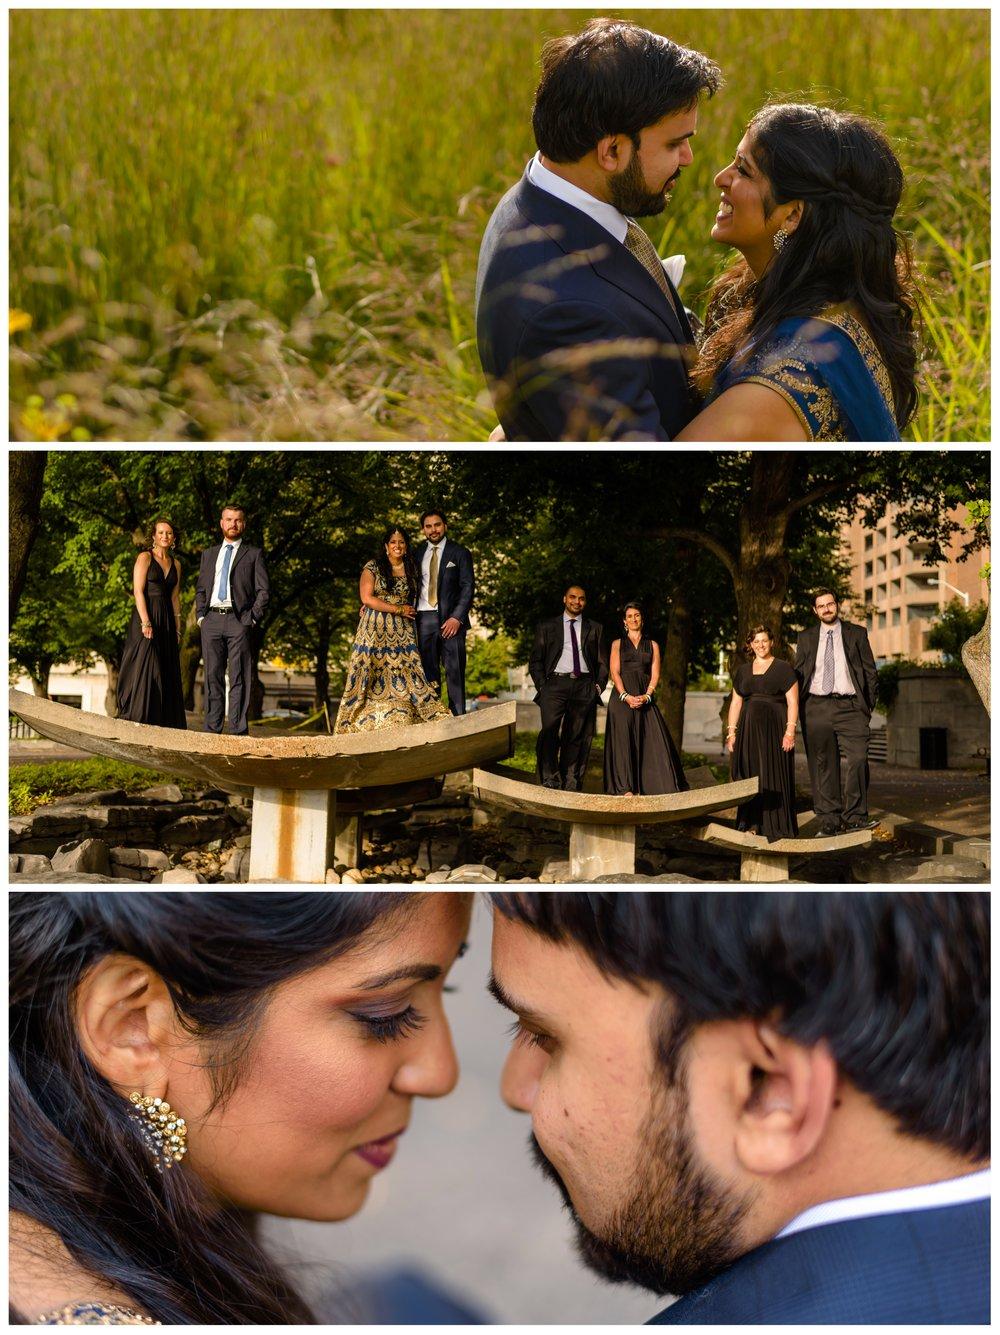 Indian wedding photographs